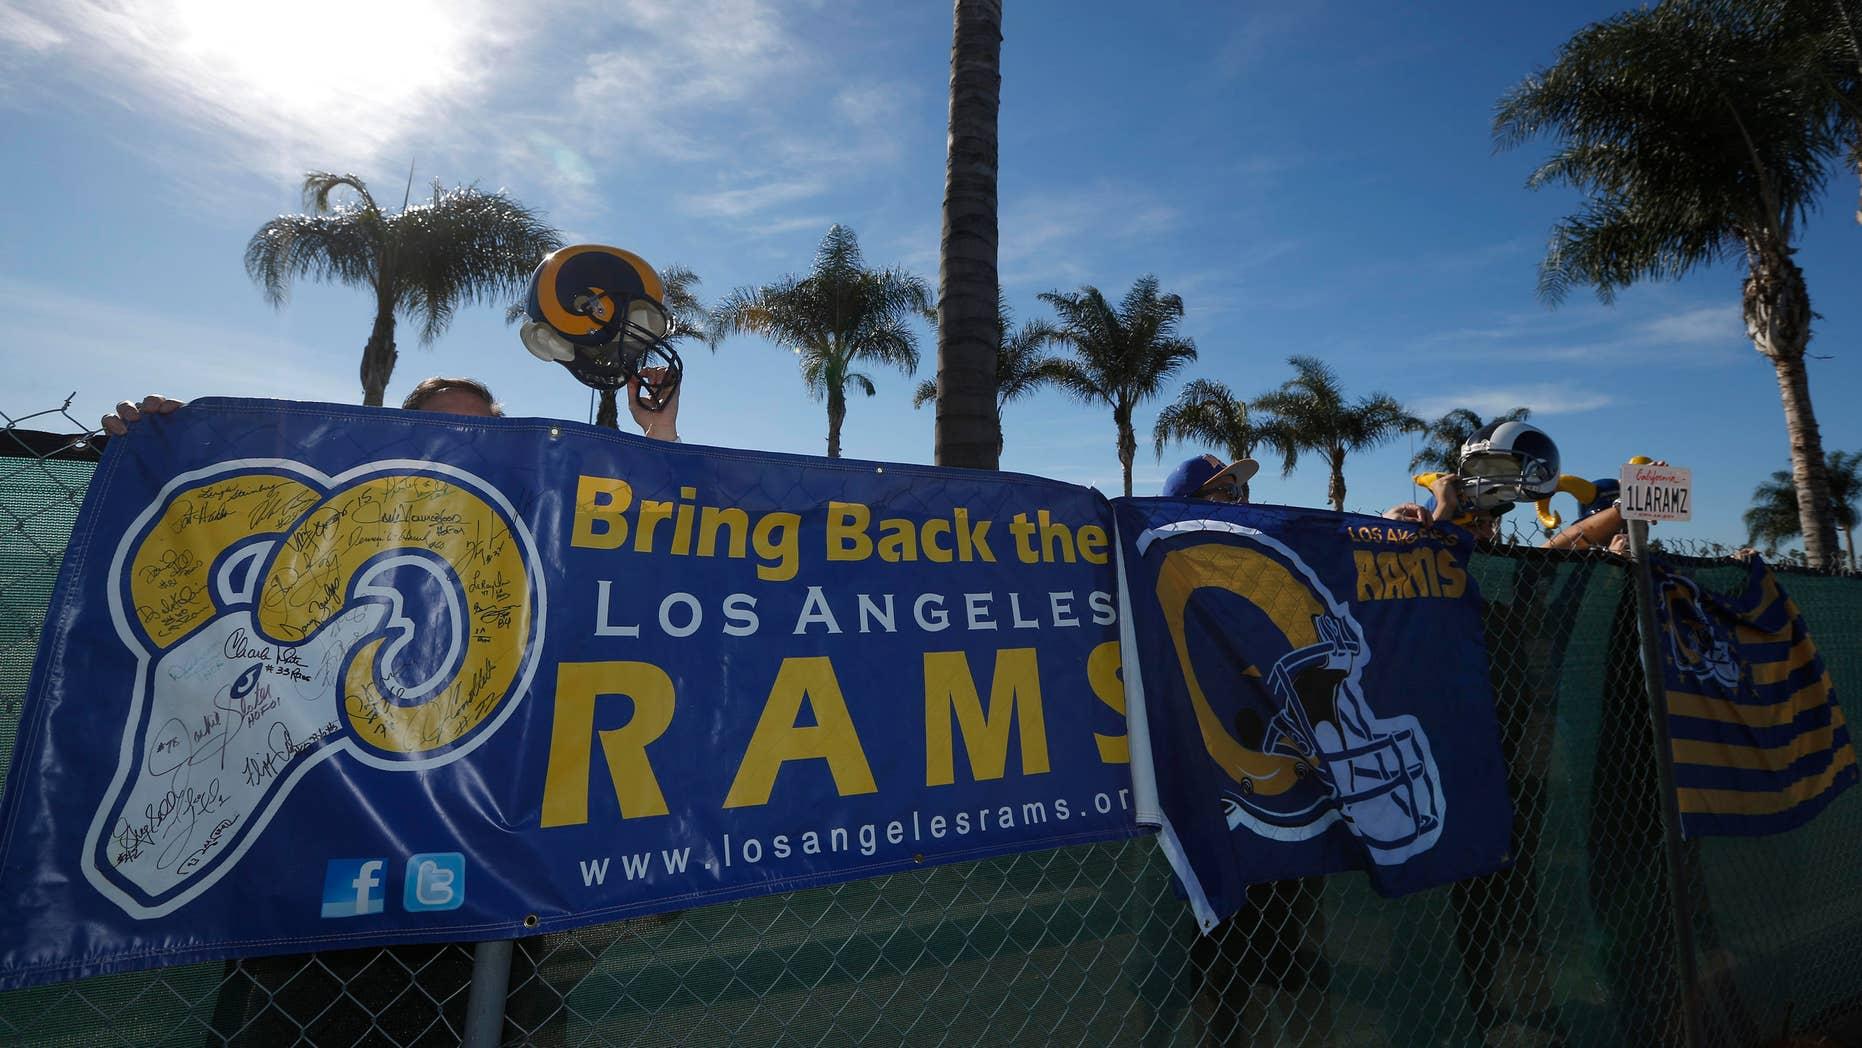 Jan. 5, 2015: NFL fans Tom Bateman (L-R), 43, Skye Sverdlin, 36, Daniel Balma, 36, and Joe Ramirez, 54, show their support for the St. Louis Rams NFL team to come to Los Angeles.